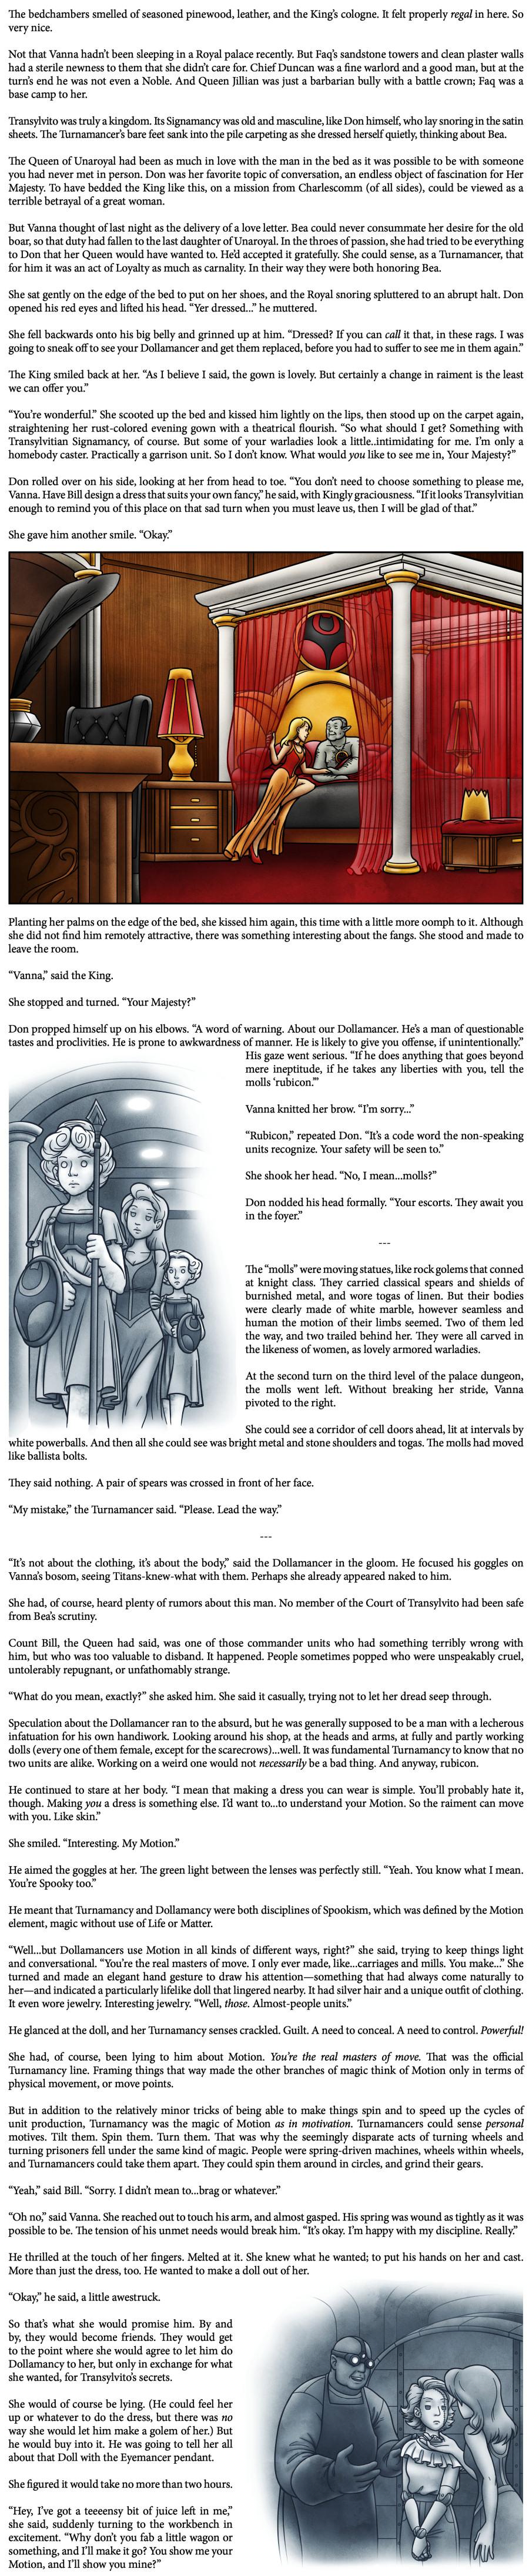 Comic - Book 4 - Page 15